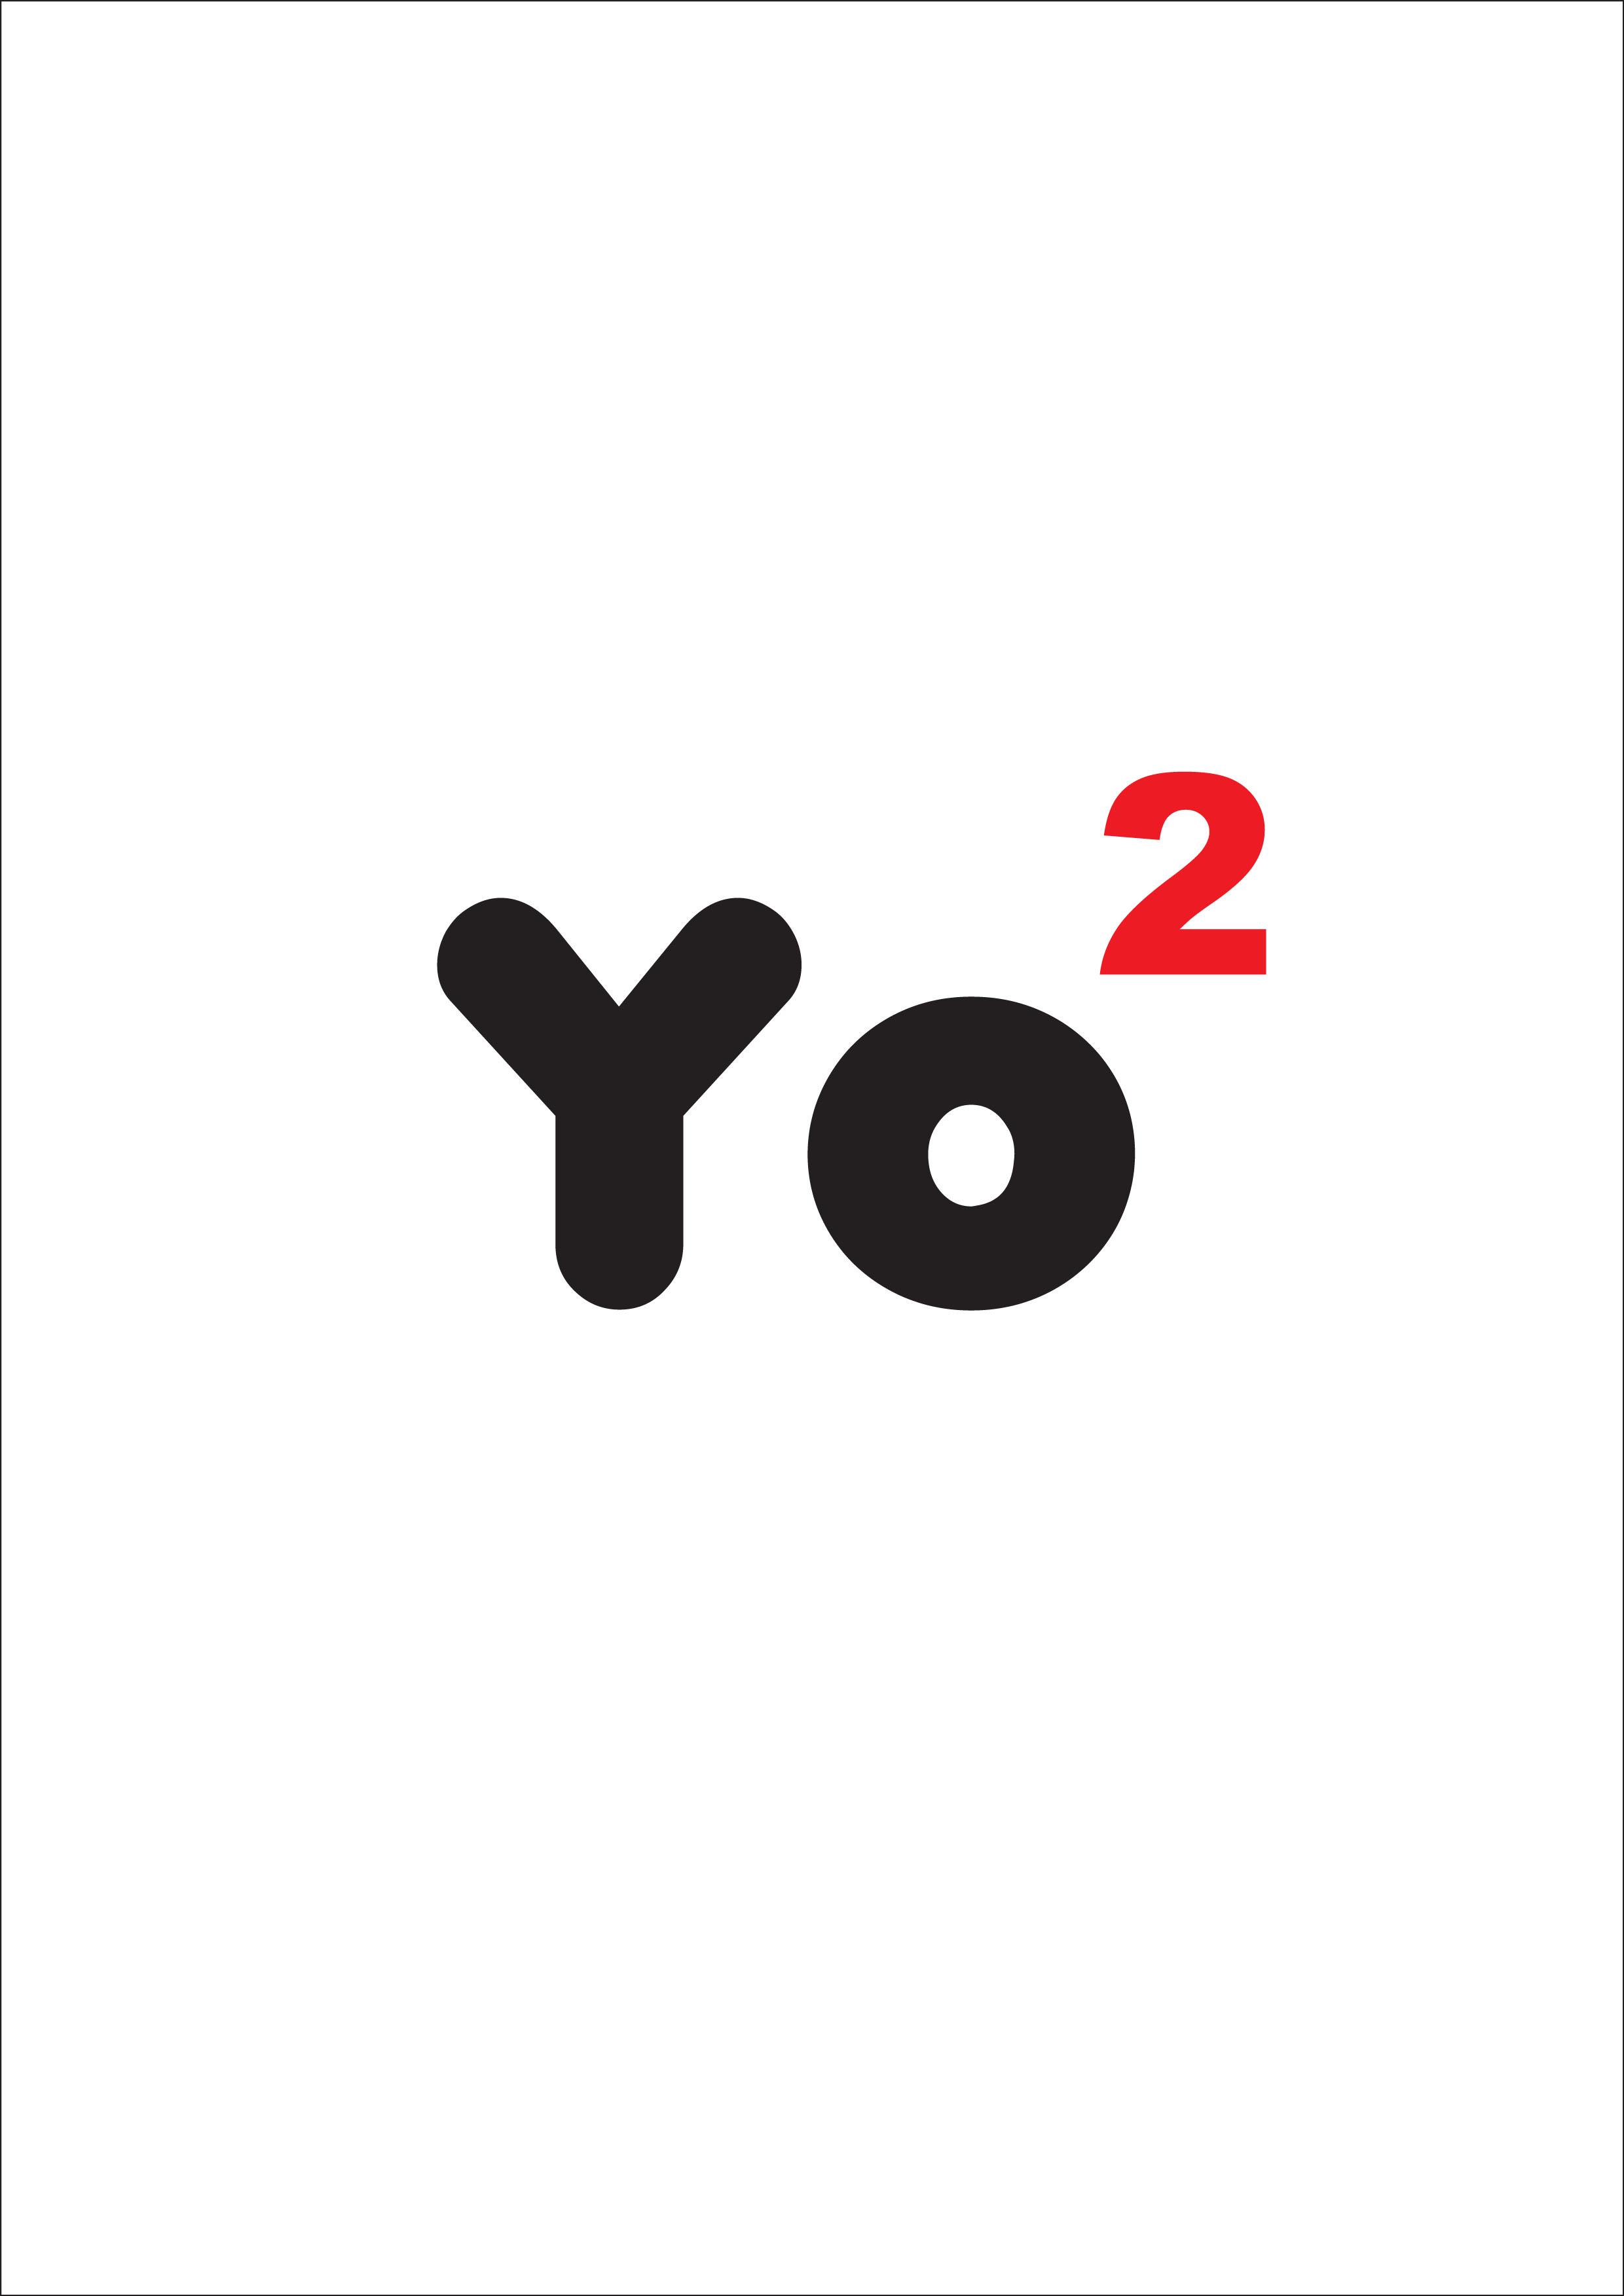 Yoyo designs archello buycottarizona Images